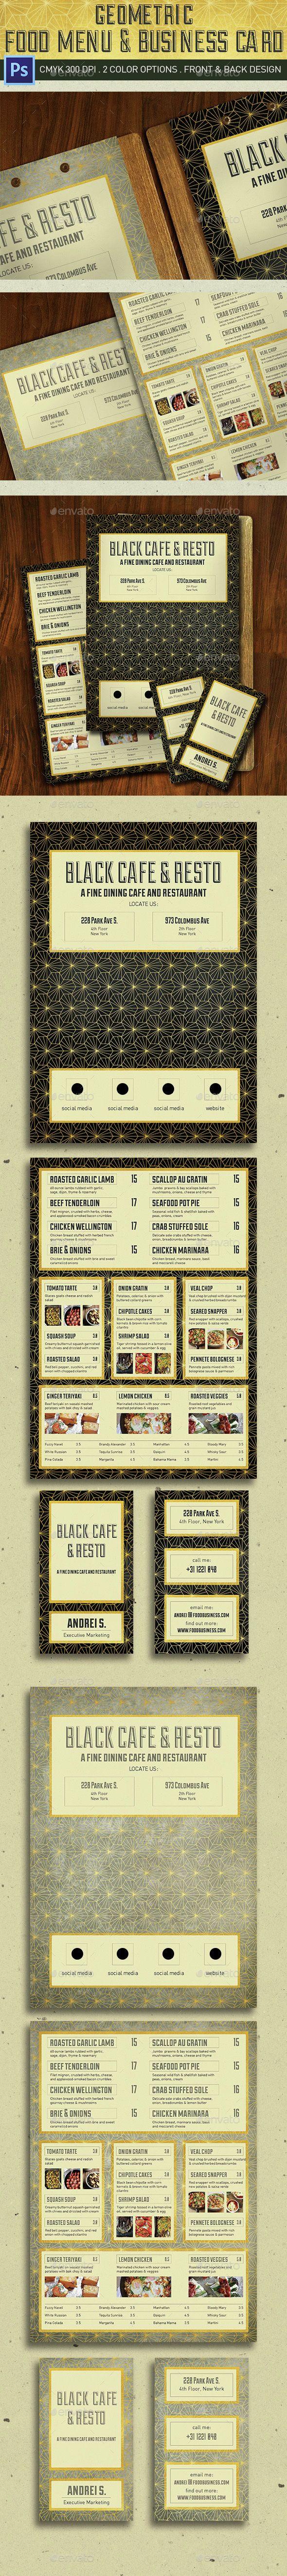 Geometric Food Menu Template PSD. Download here: http://graphicriver.net/item/geometric-food-menu/14937003?ref=ksioks